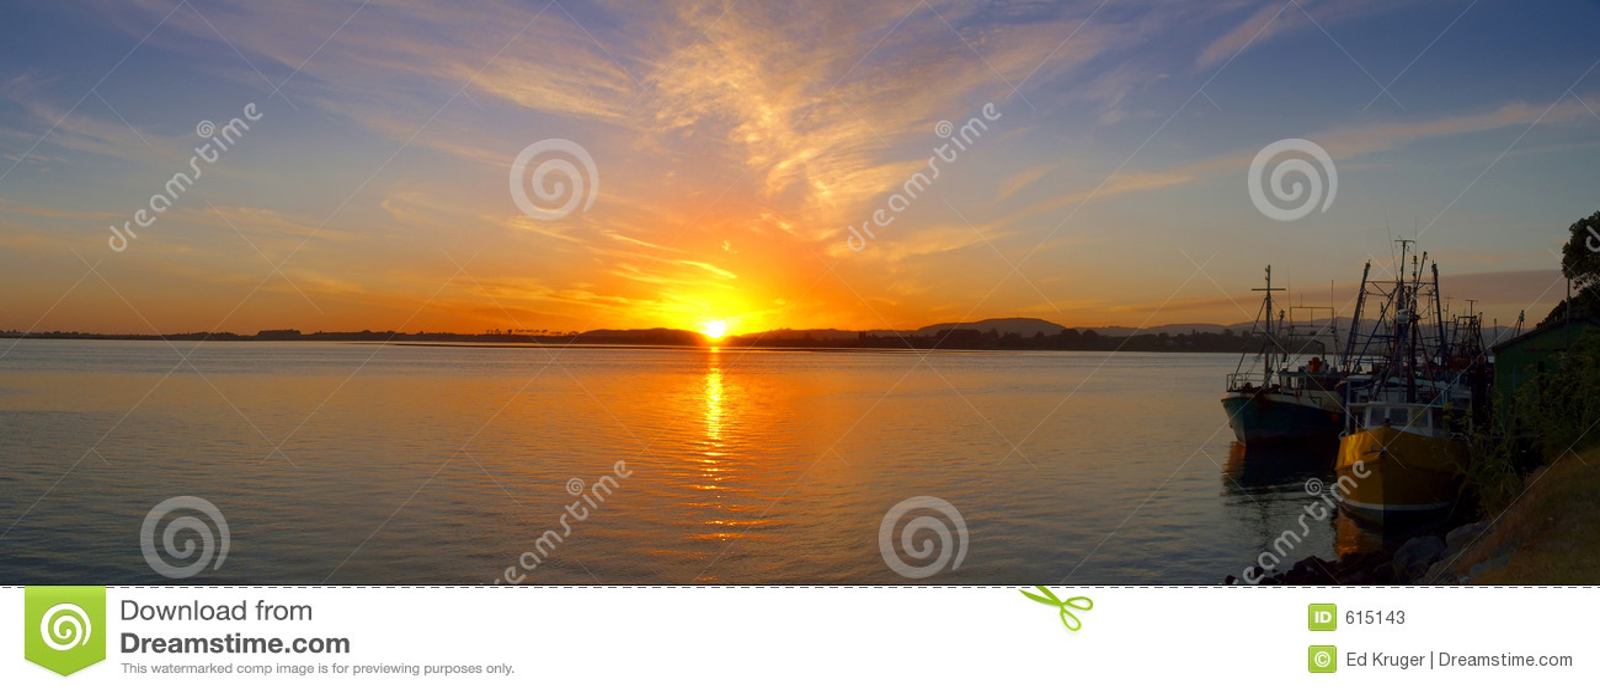 Early morning - sunrise over fishing harbor